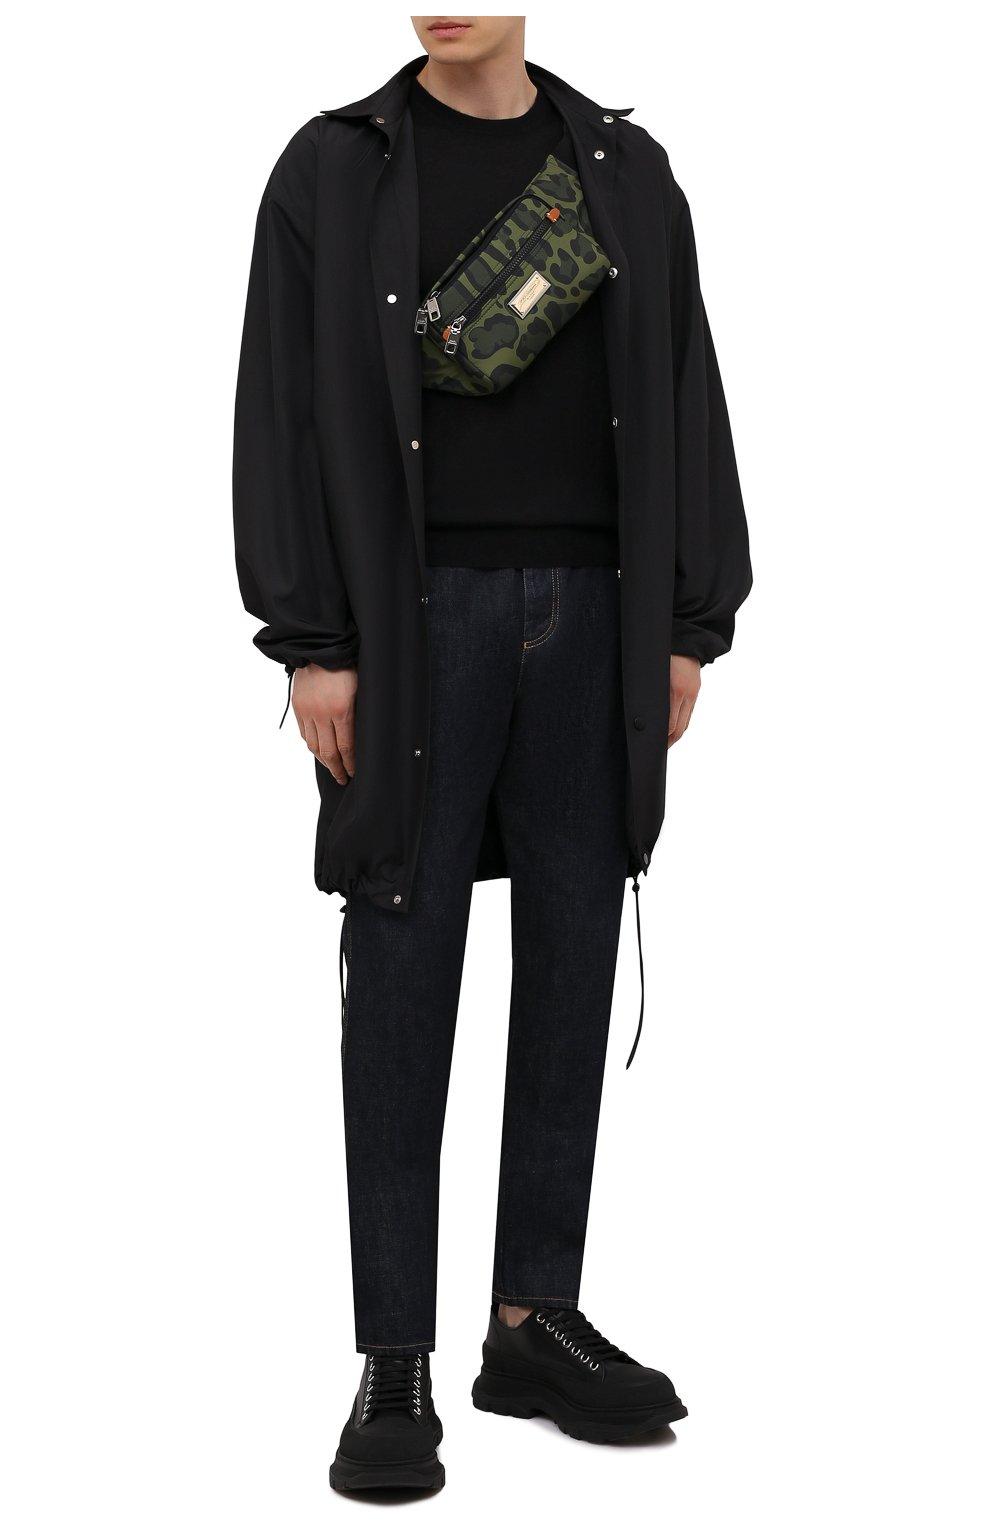 Мужская текстильная поясная сумка nero sicilia dna DOLCE & GABBANA хаки цвета, арт. BM1967/A0885 | Фото 2